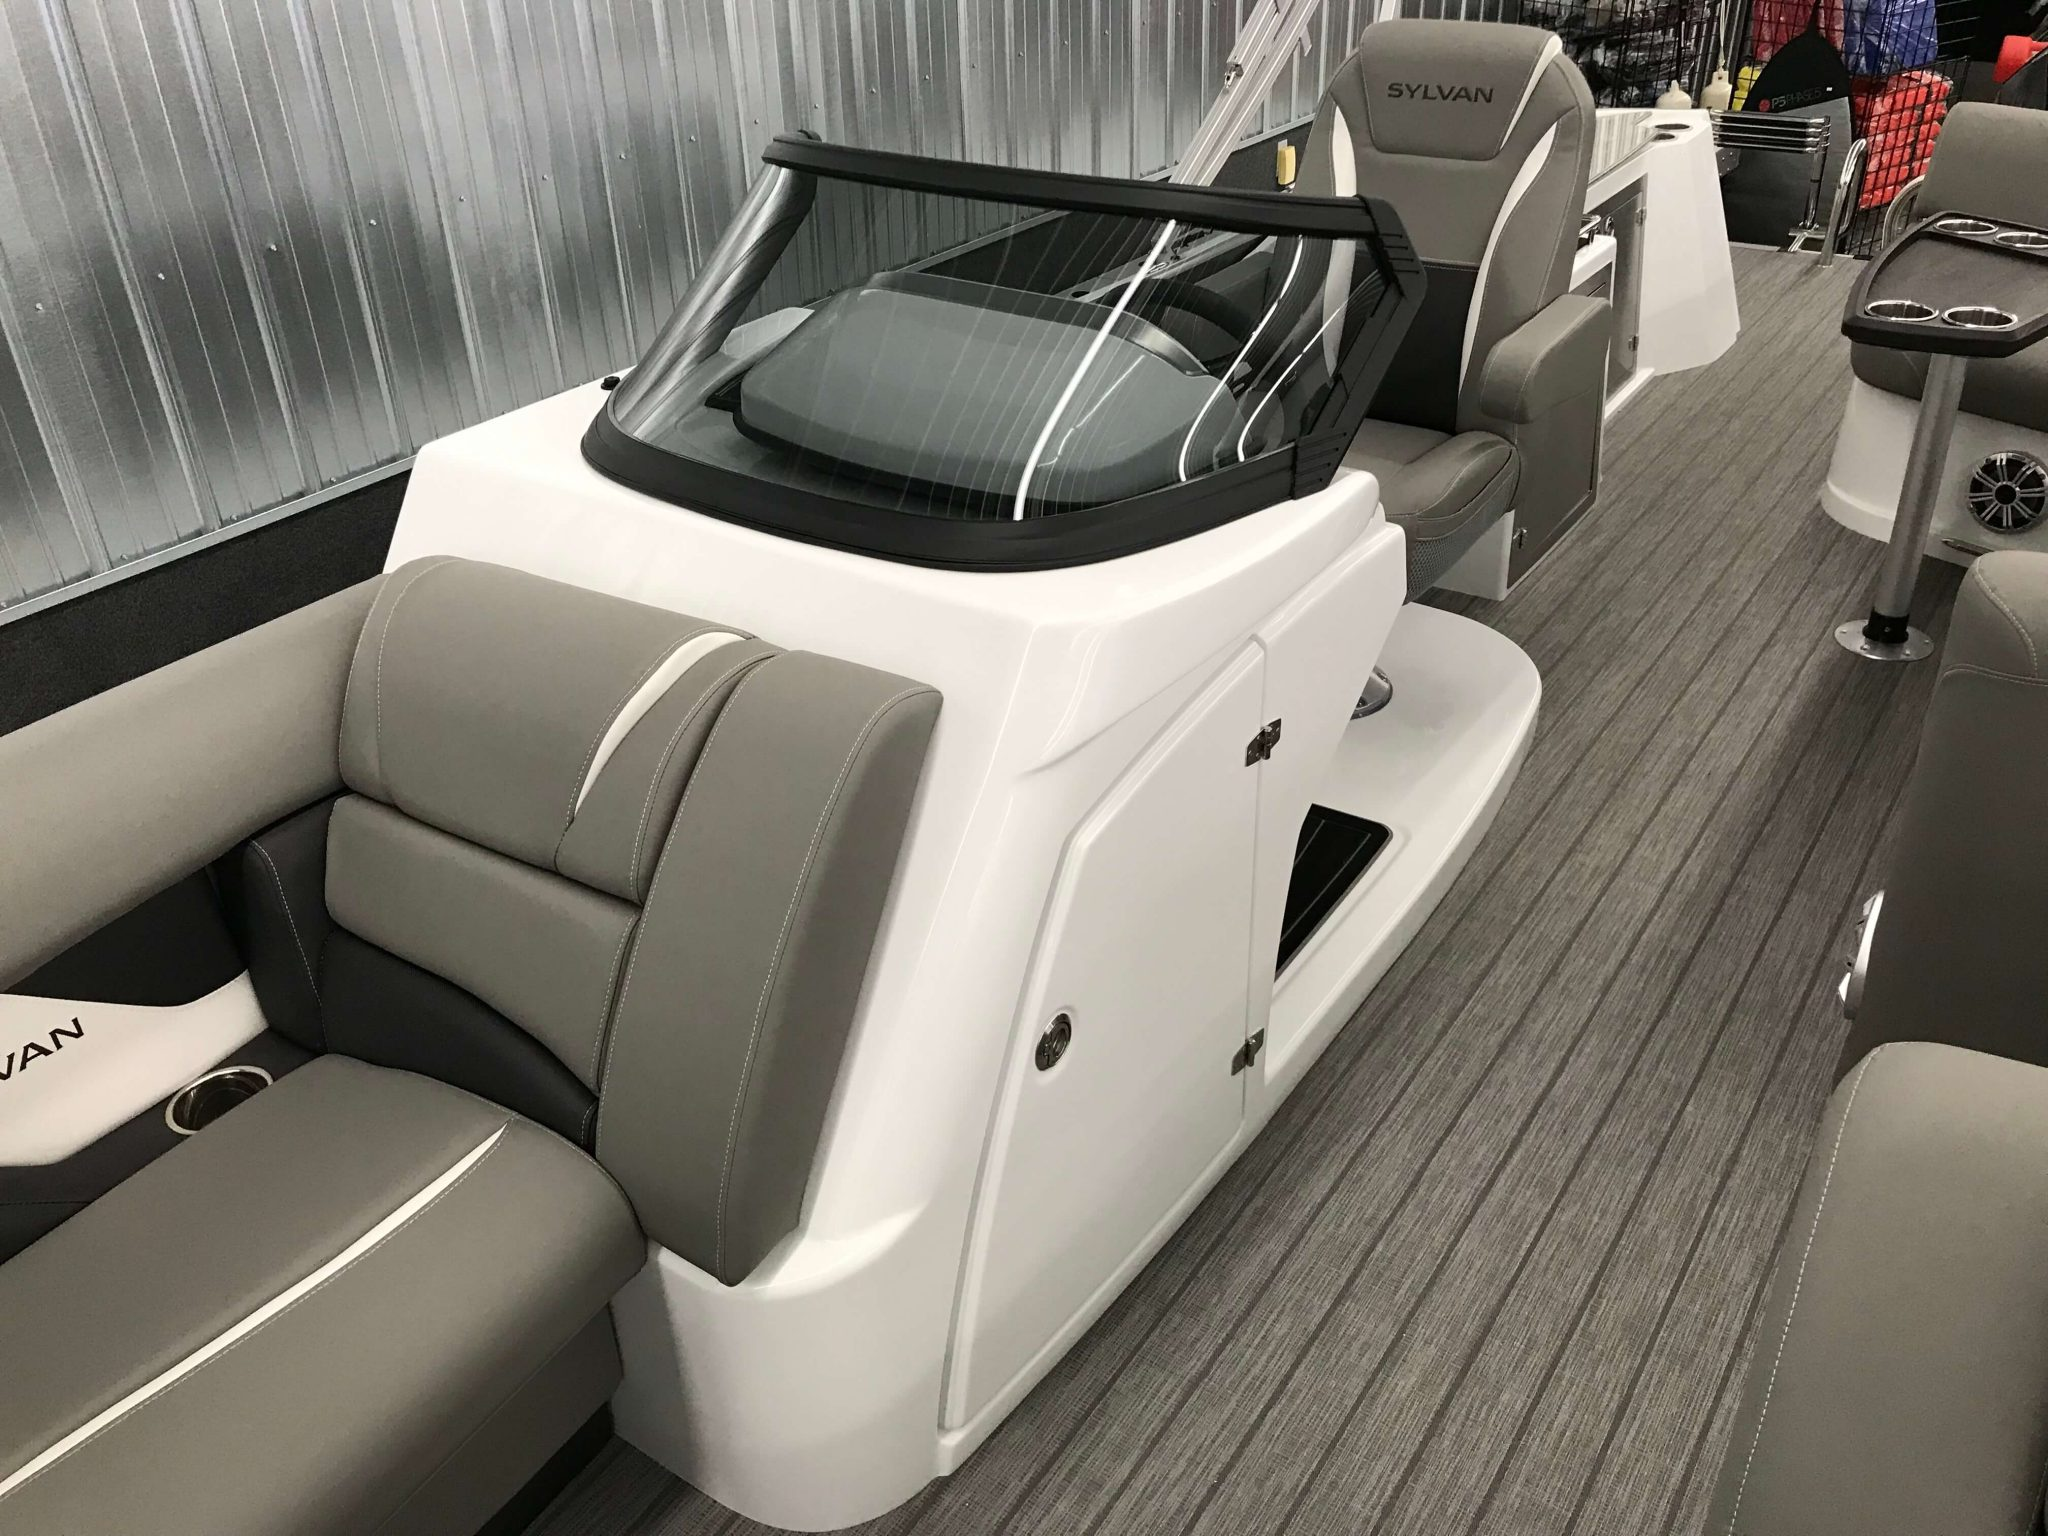 2019 Sylvan S3 Cruise Tritoon Helm Windsheild